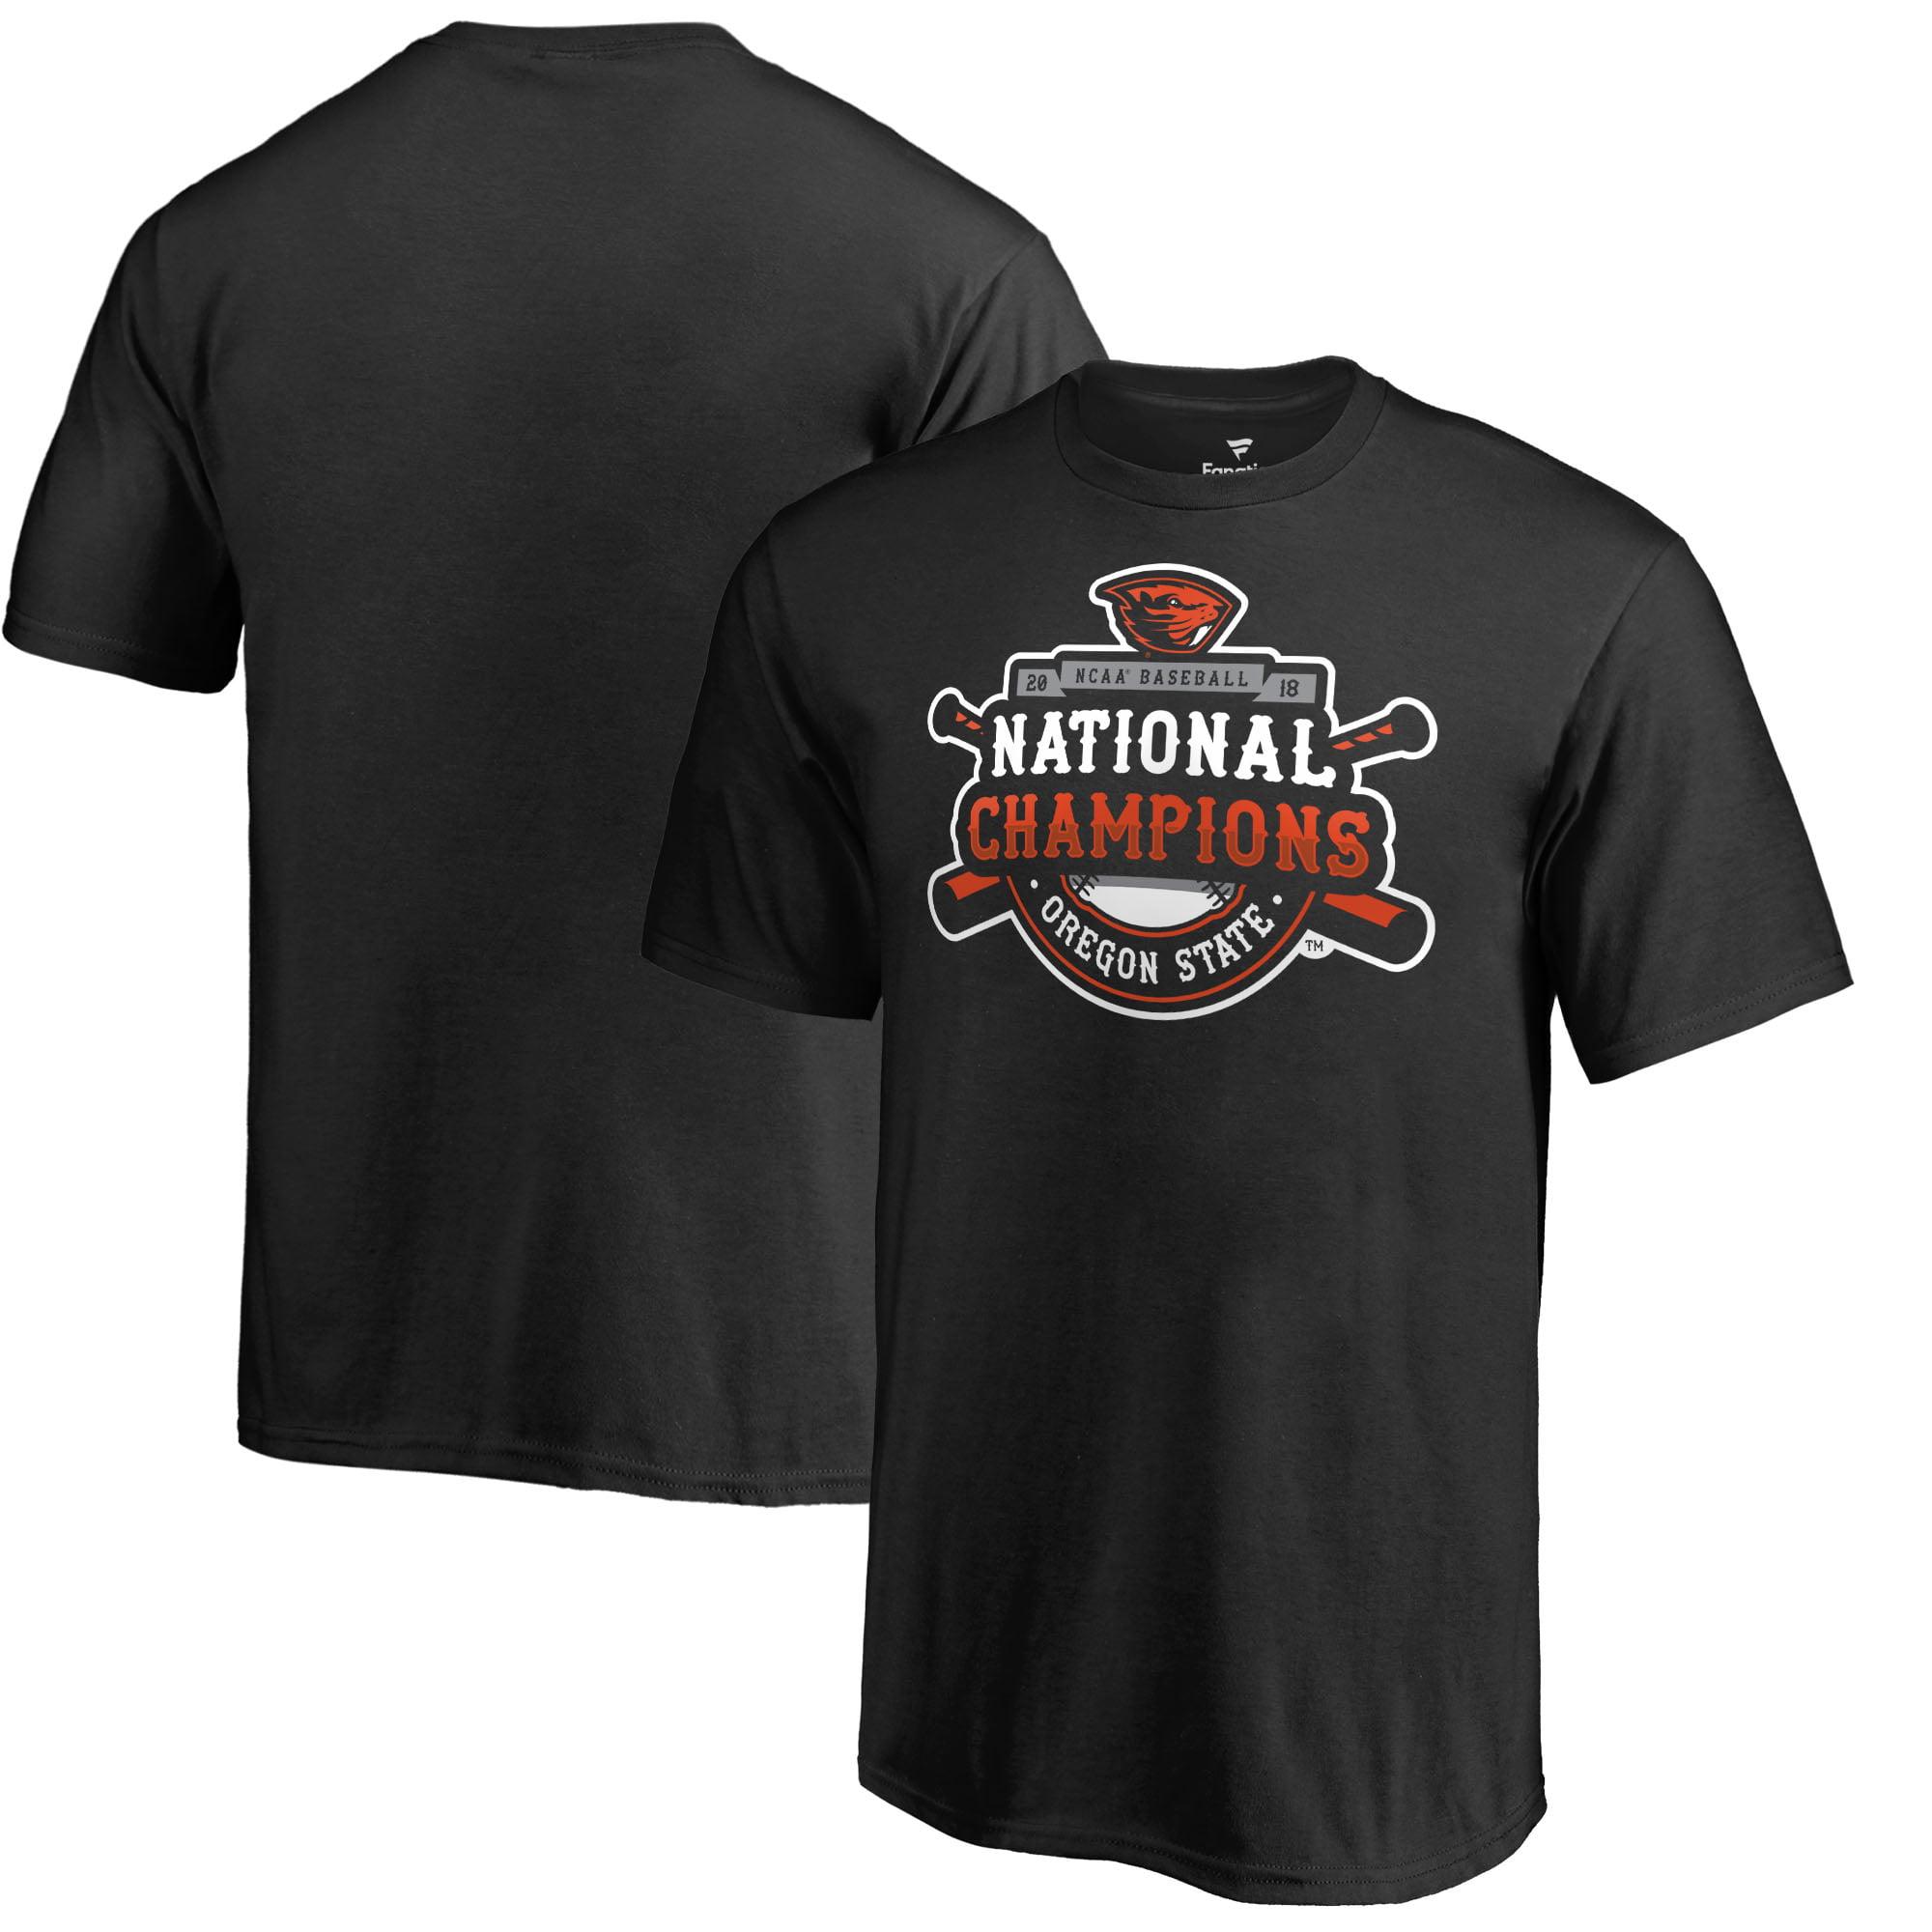 07a55482 Oregon State Beavers Fanatics Branded Youth 2018 NCAA Men's Baseball  College World Series National Champions Grand Slam T-Shirt - Black -  Walmart.com